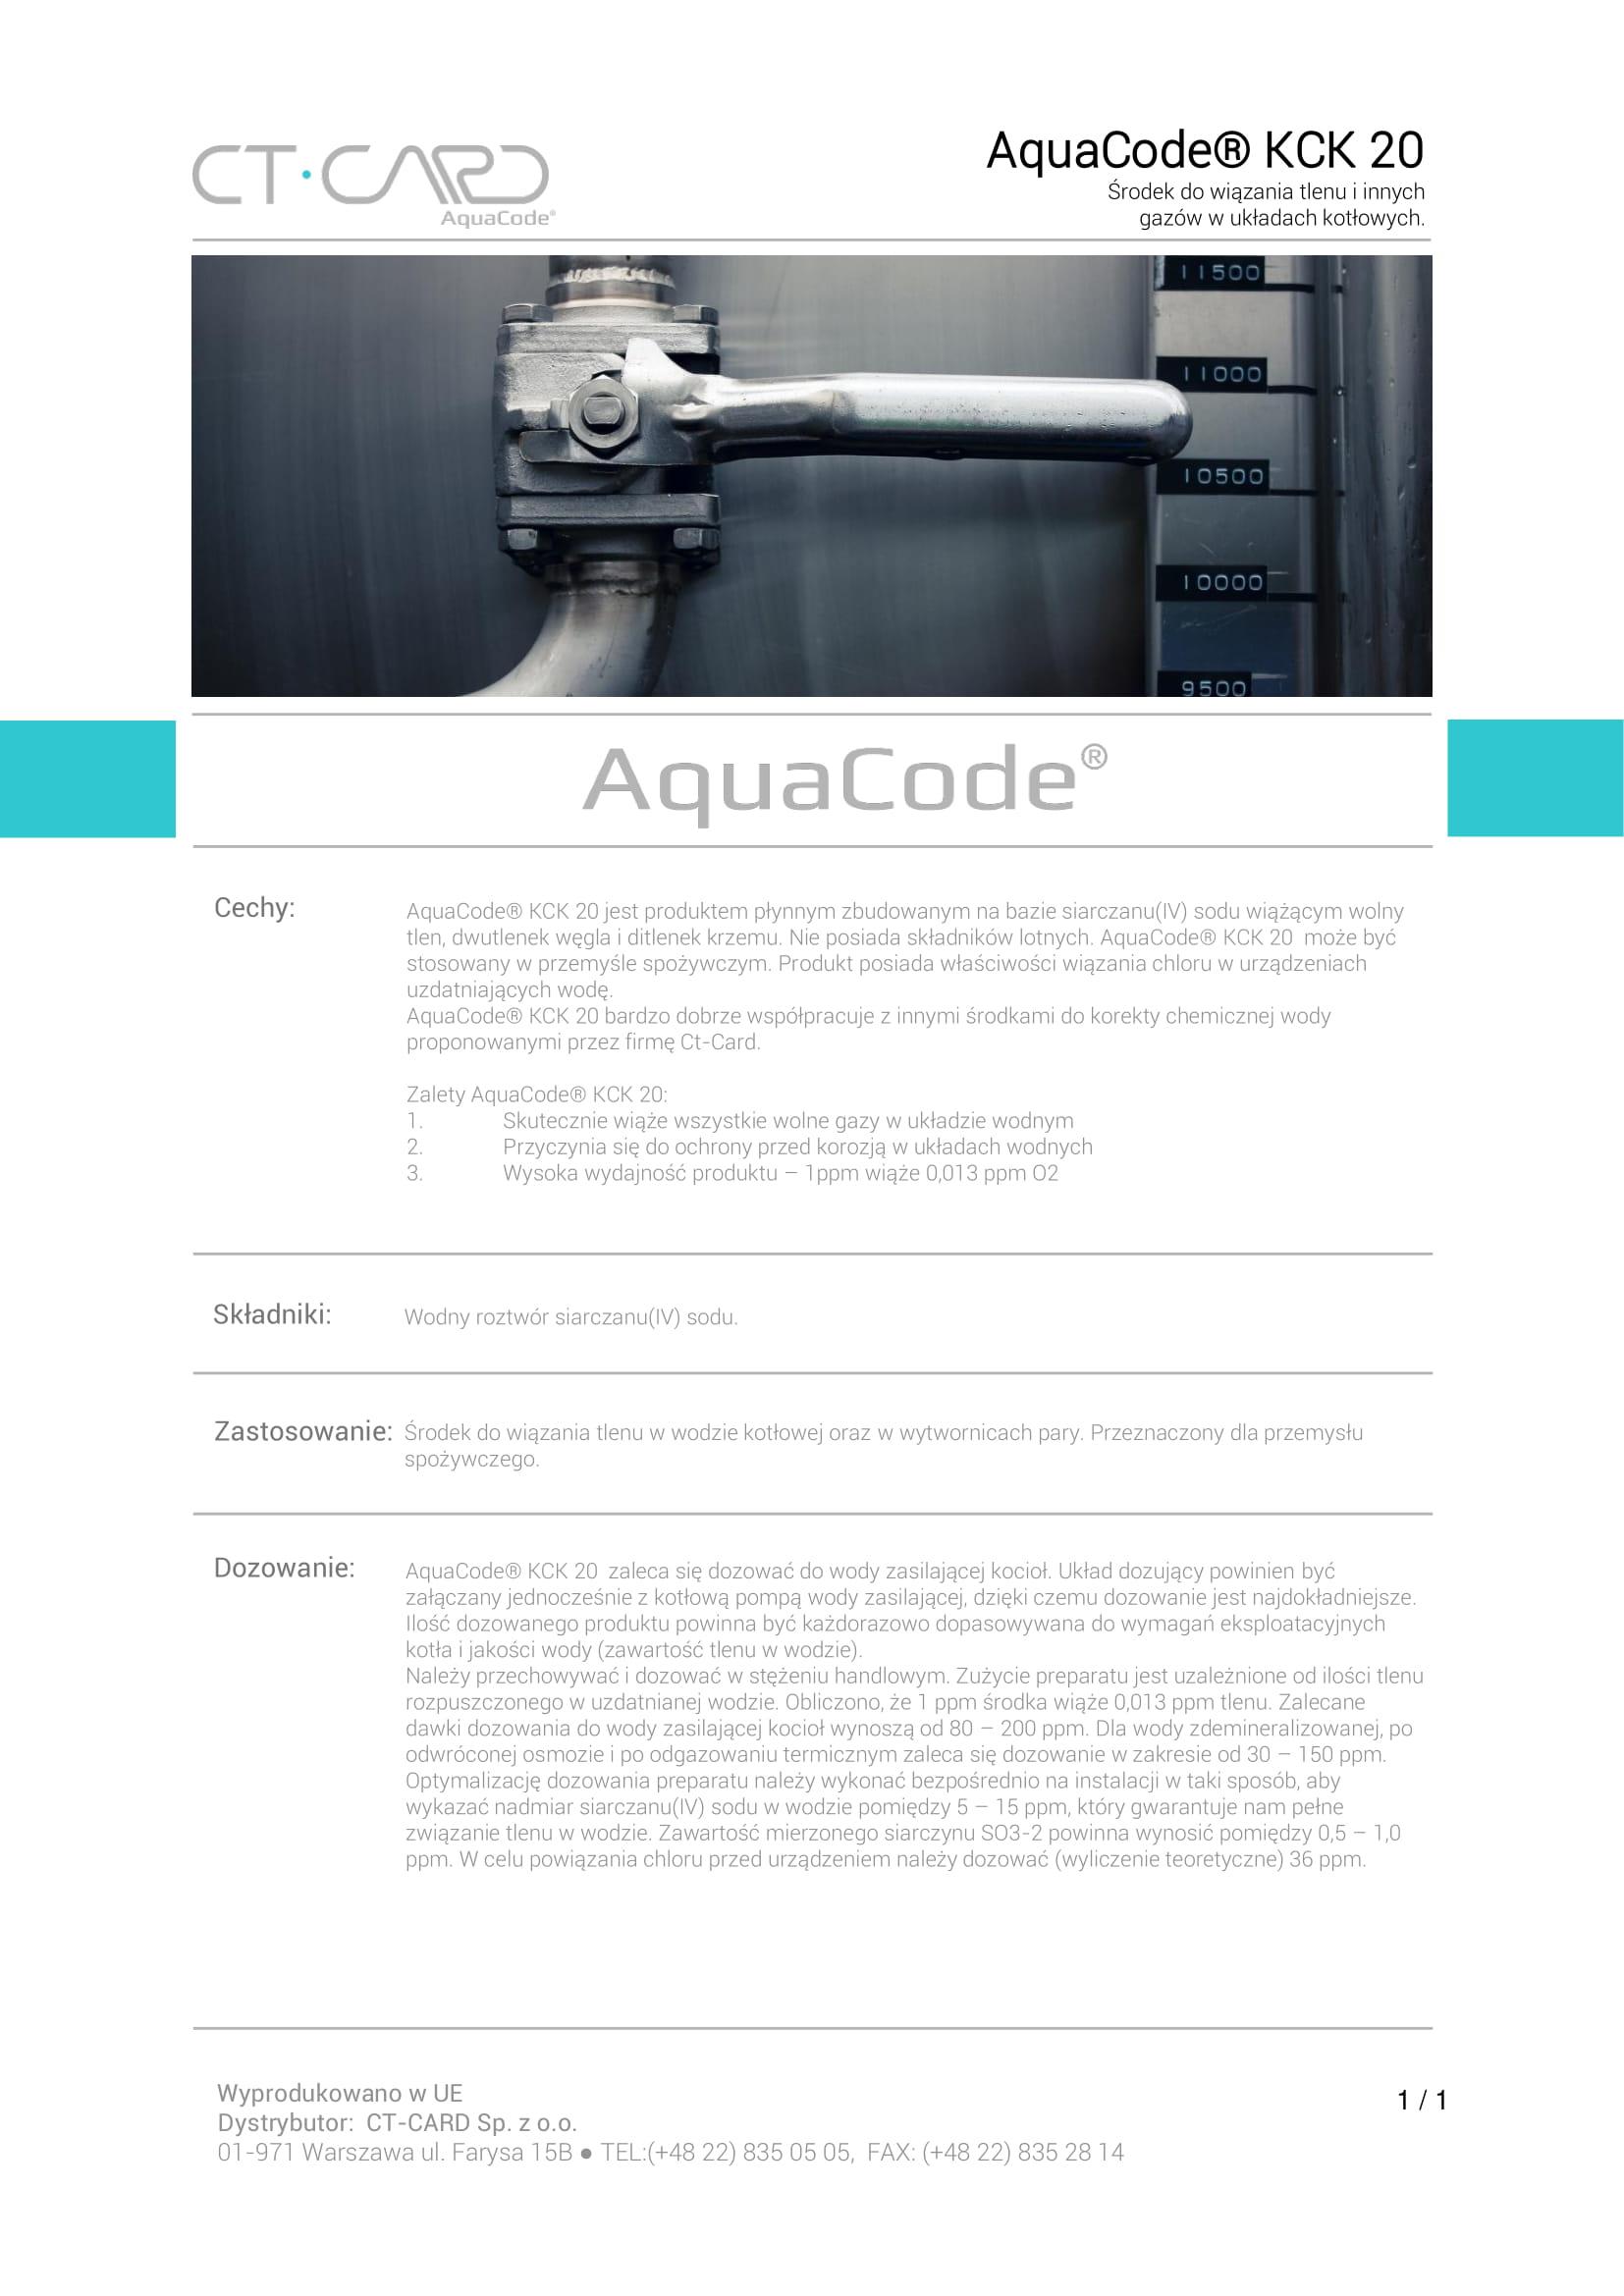 AquaCode_KCK_20-1